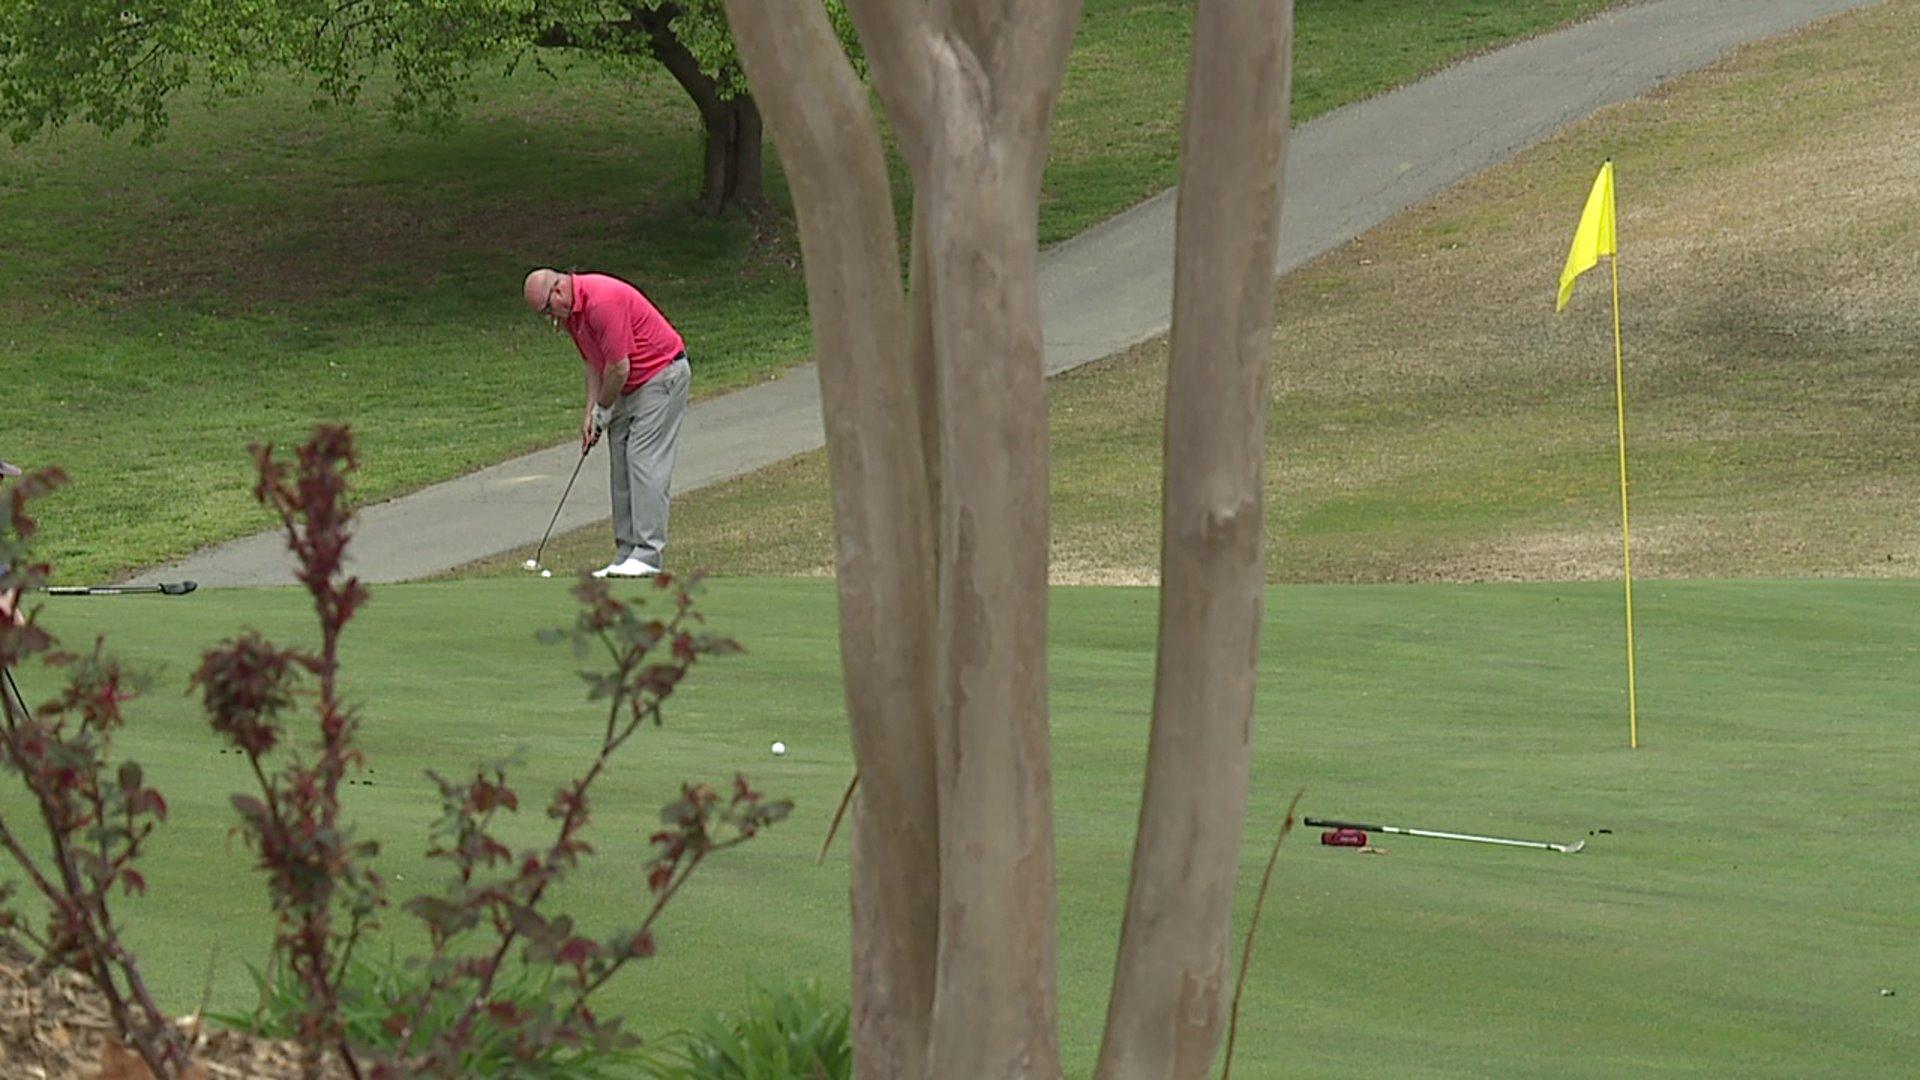 Local golfers still enjoying the sport while following coronavirus guidelines